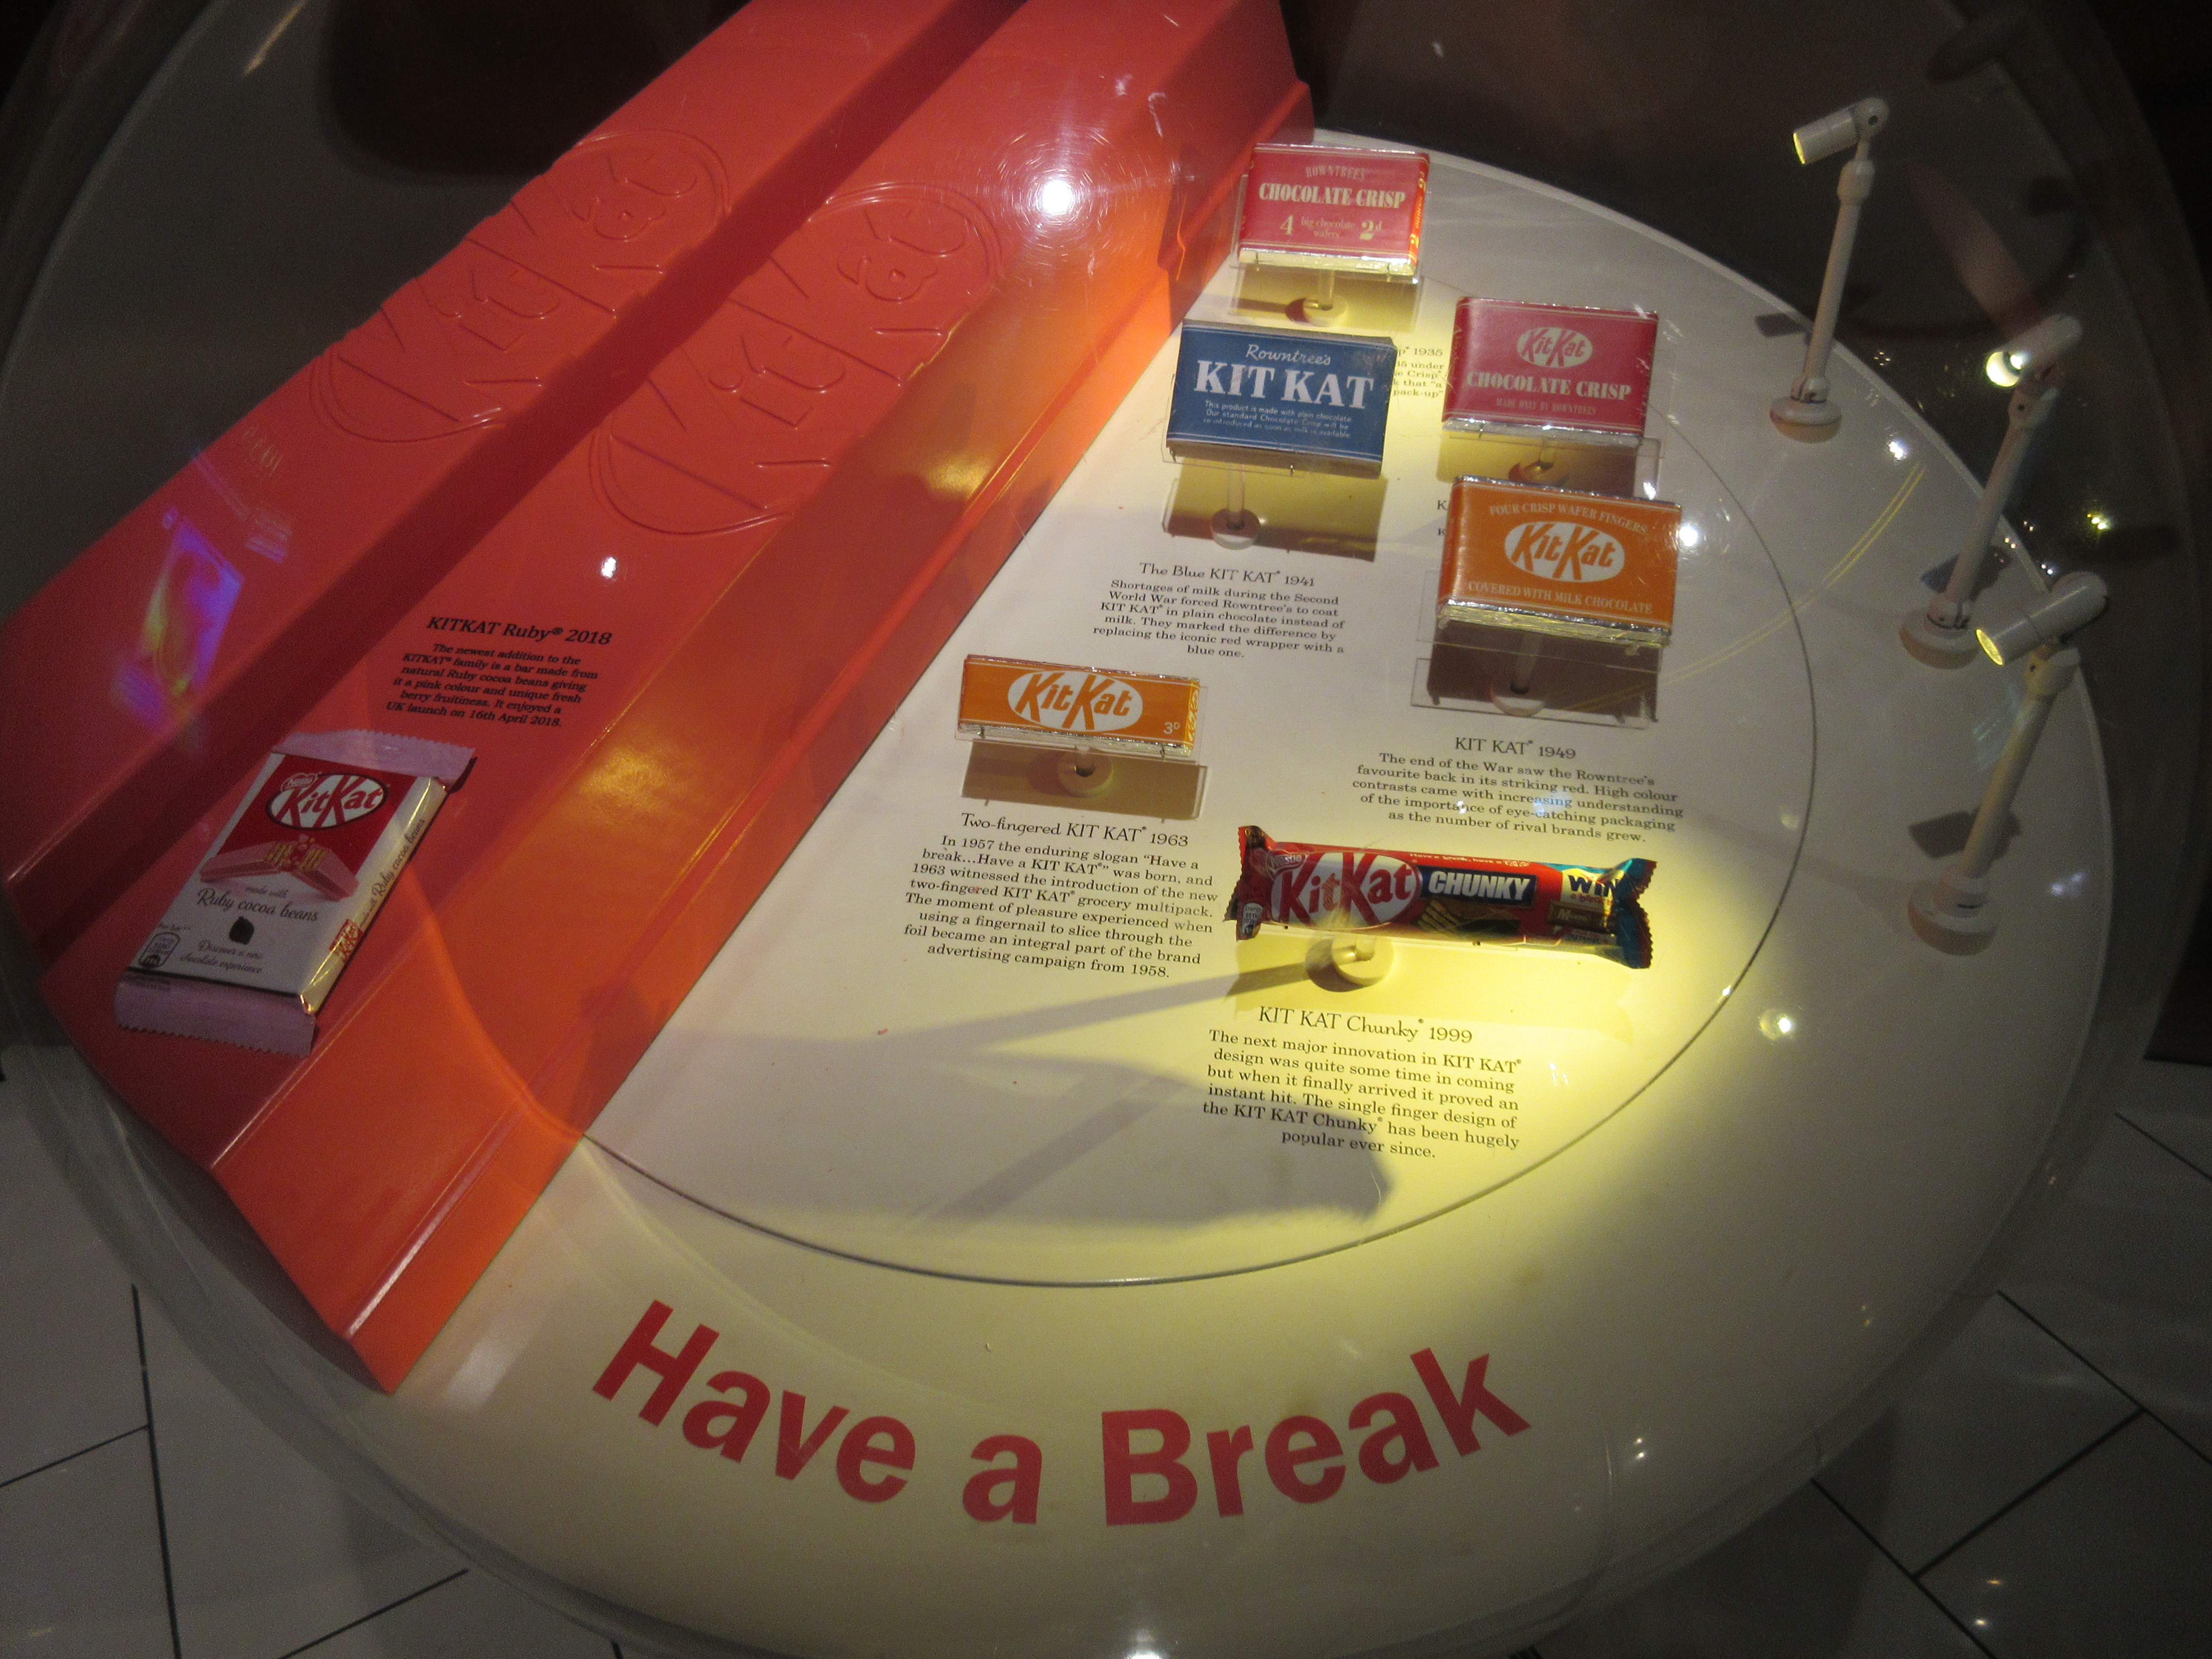 York chocolate museum - photo by Juliamaud